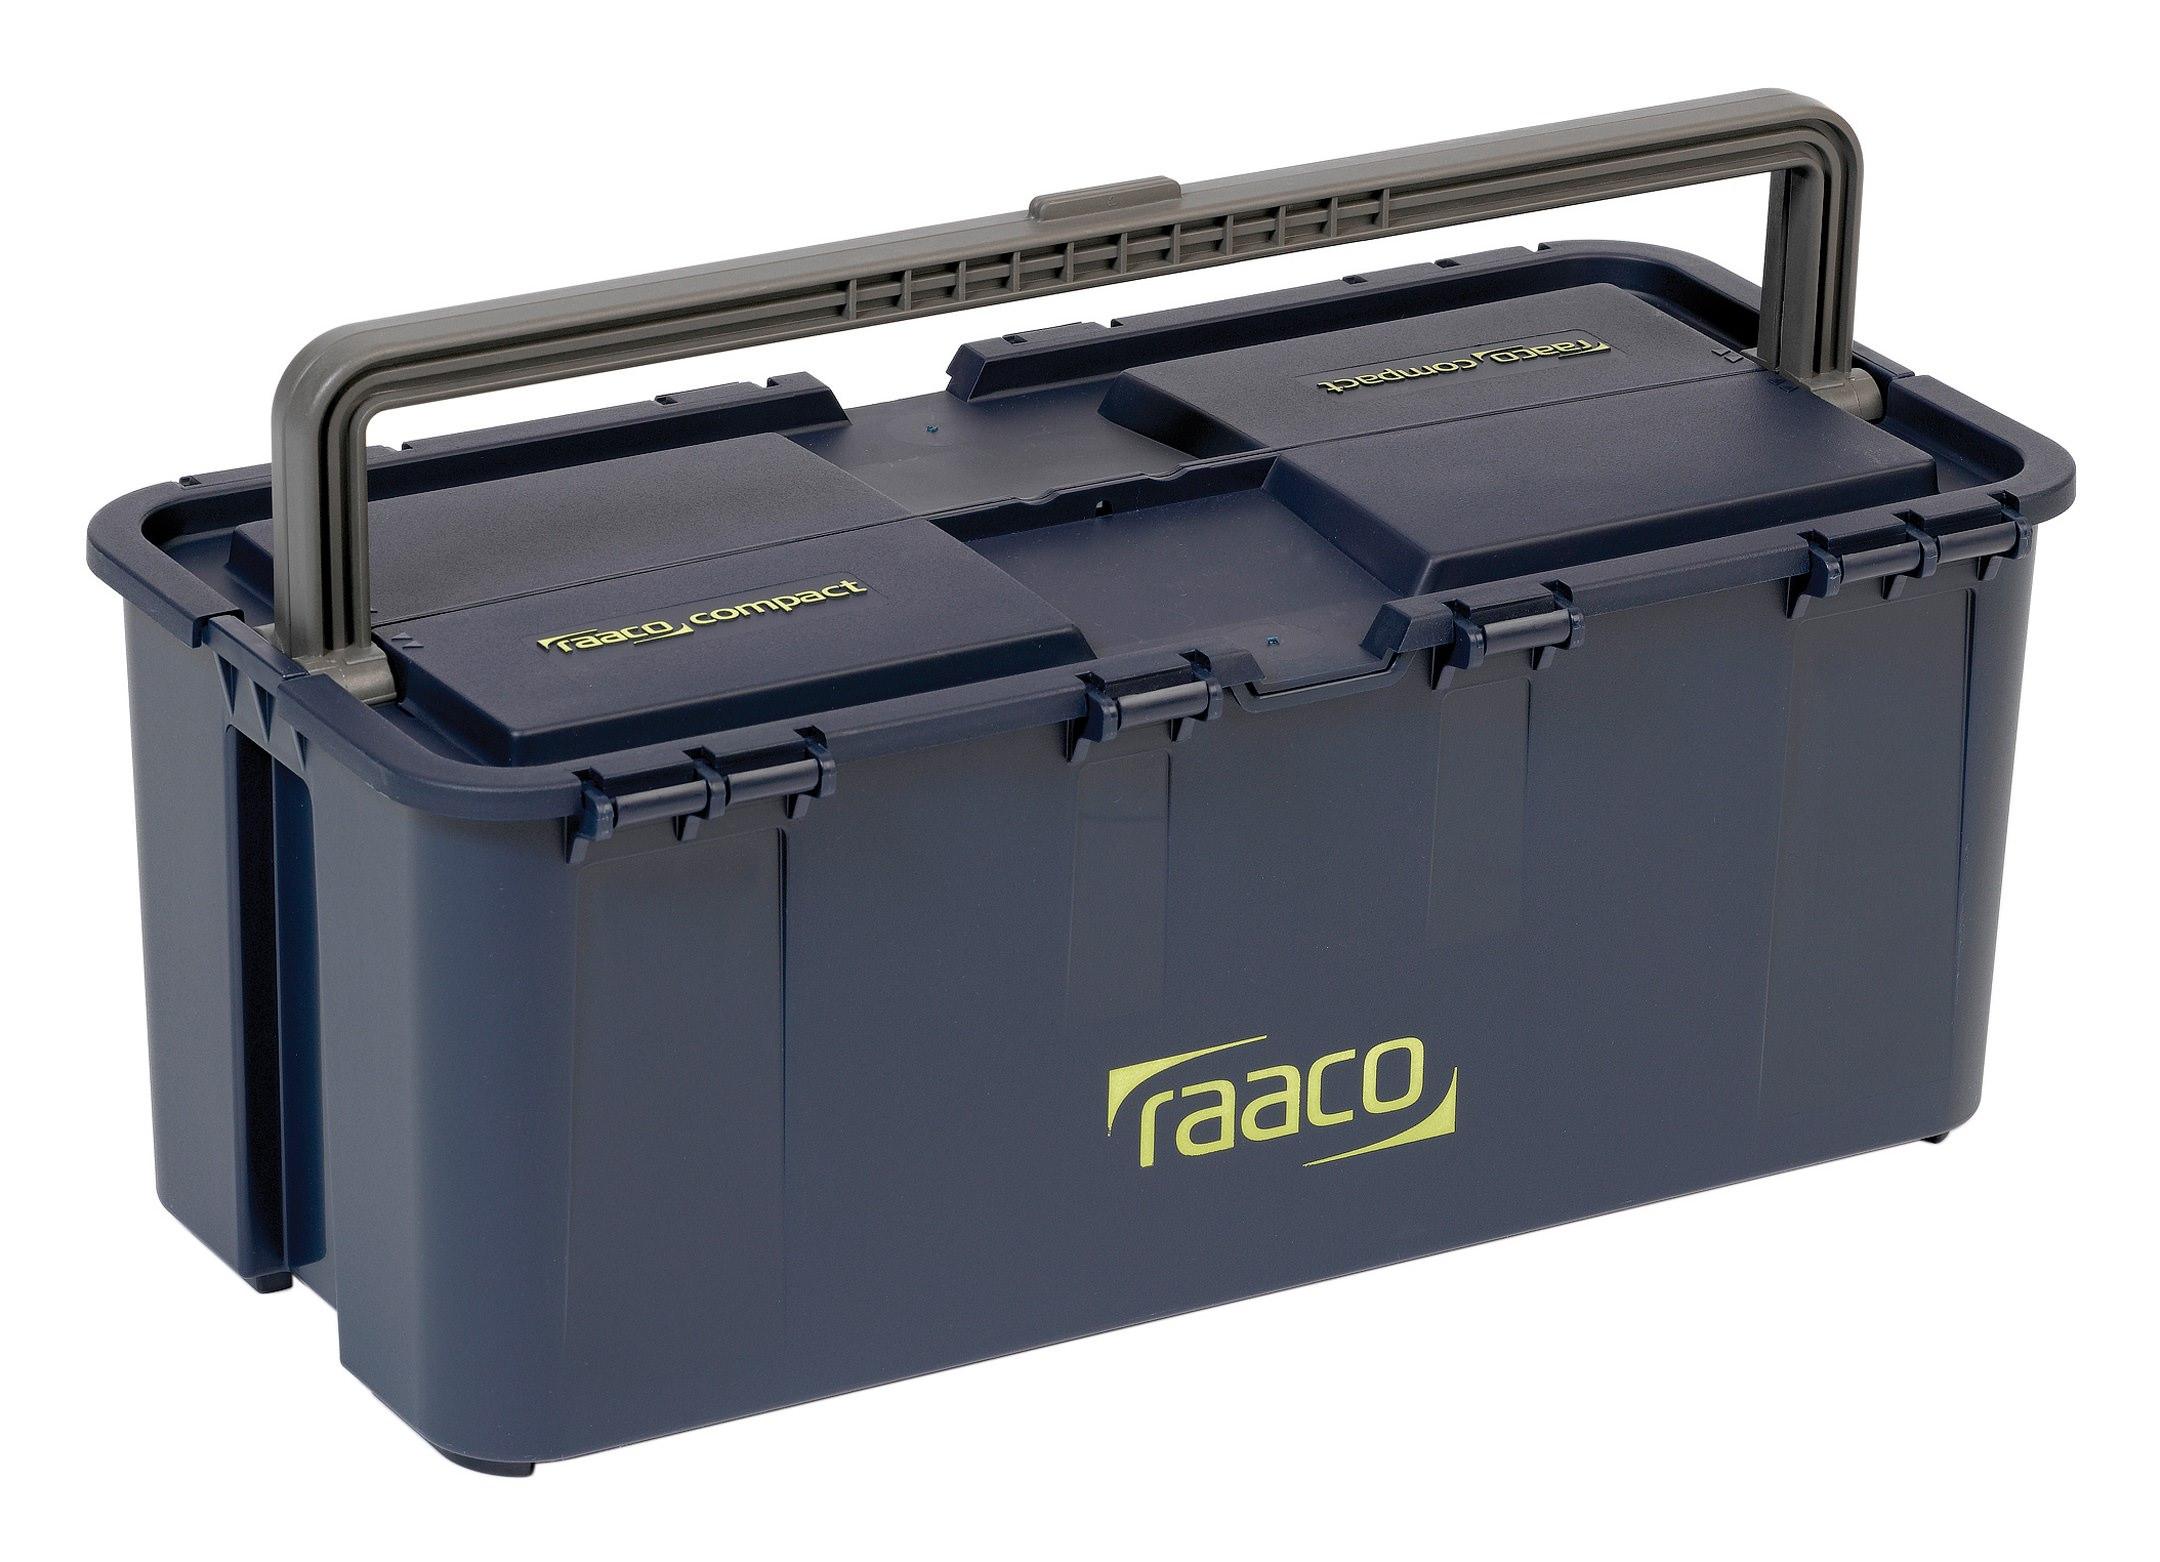 Werkzeugkoffer Compact 20 raaco blau - 136570